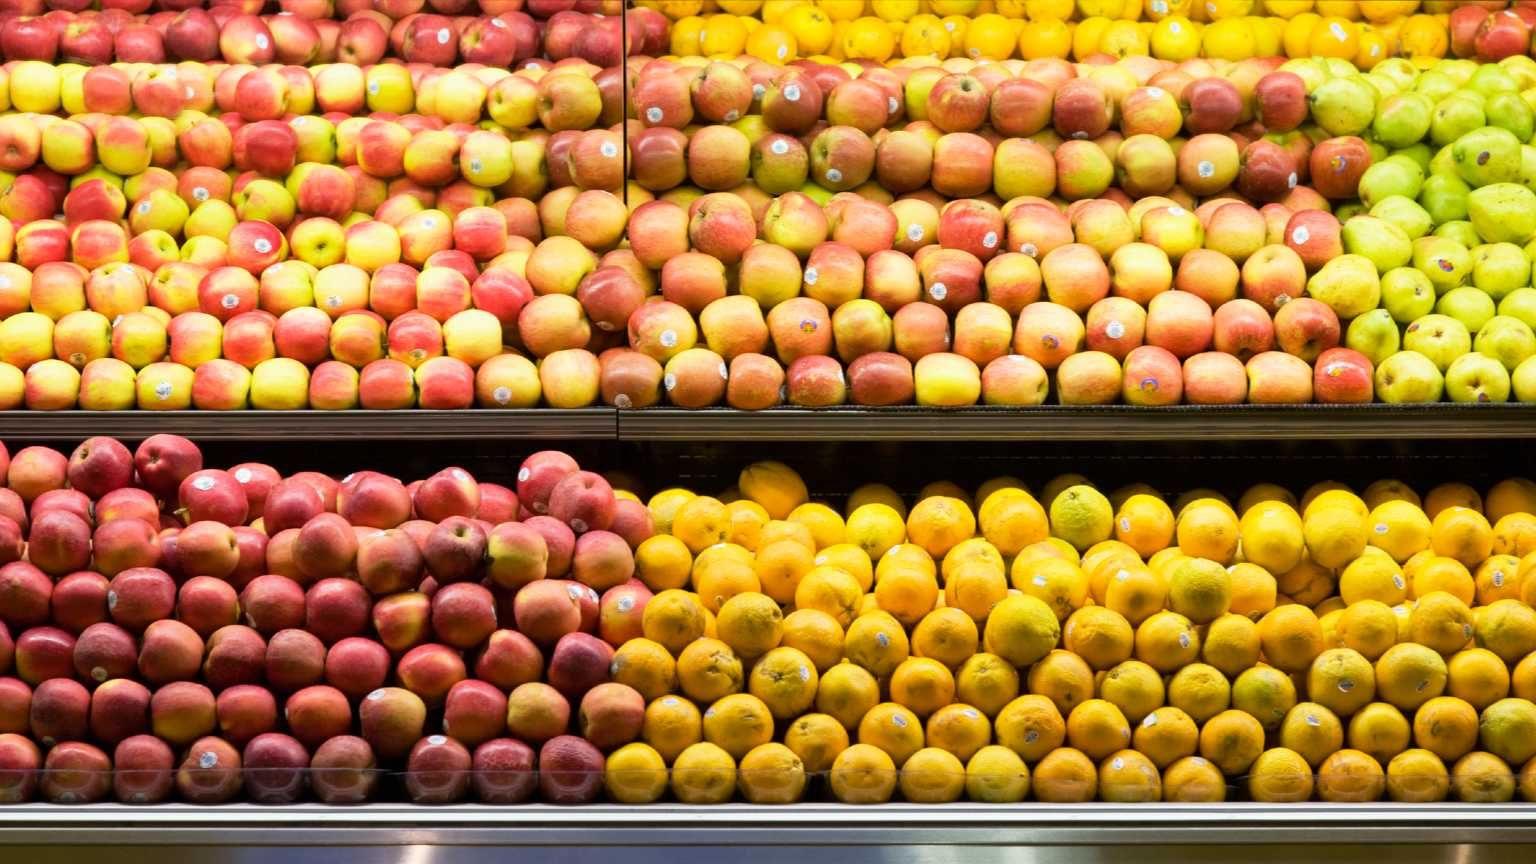 Apples in supermarket